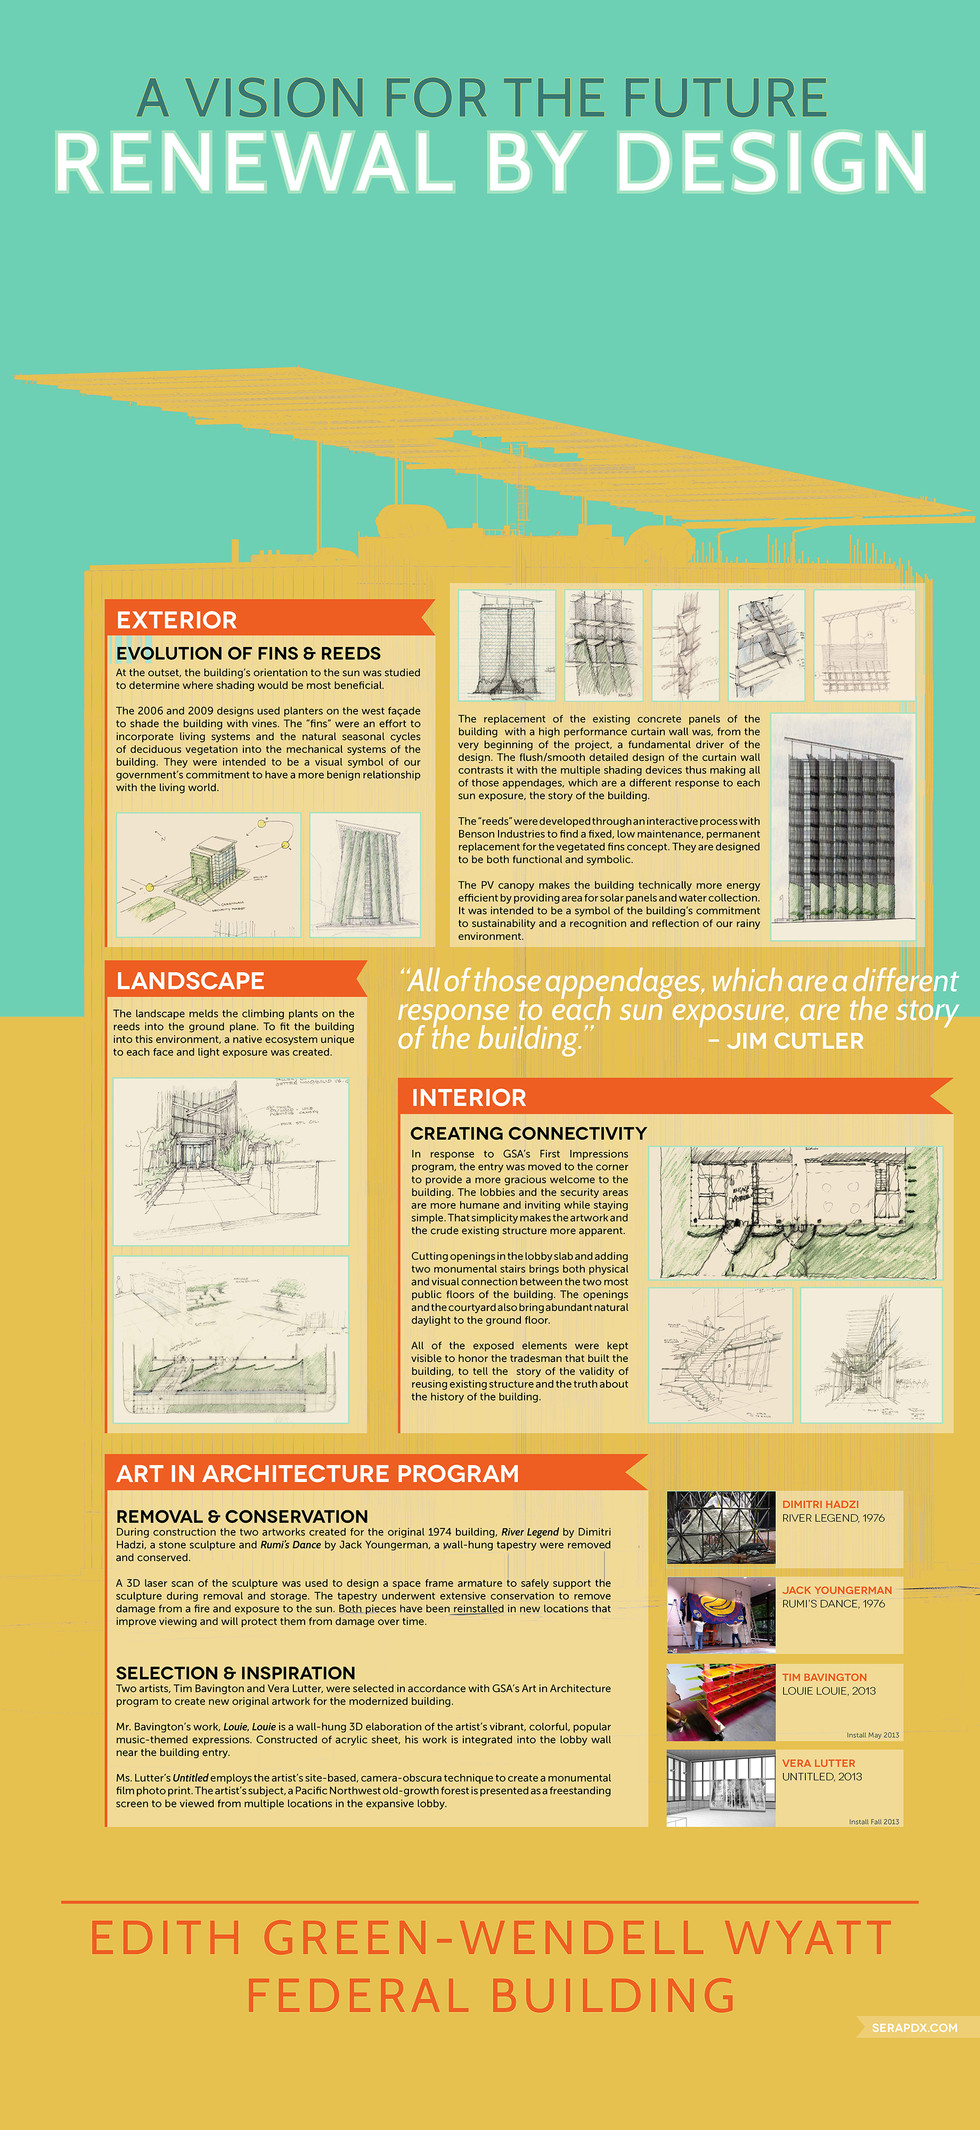 Infographic: Design Vision